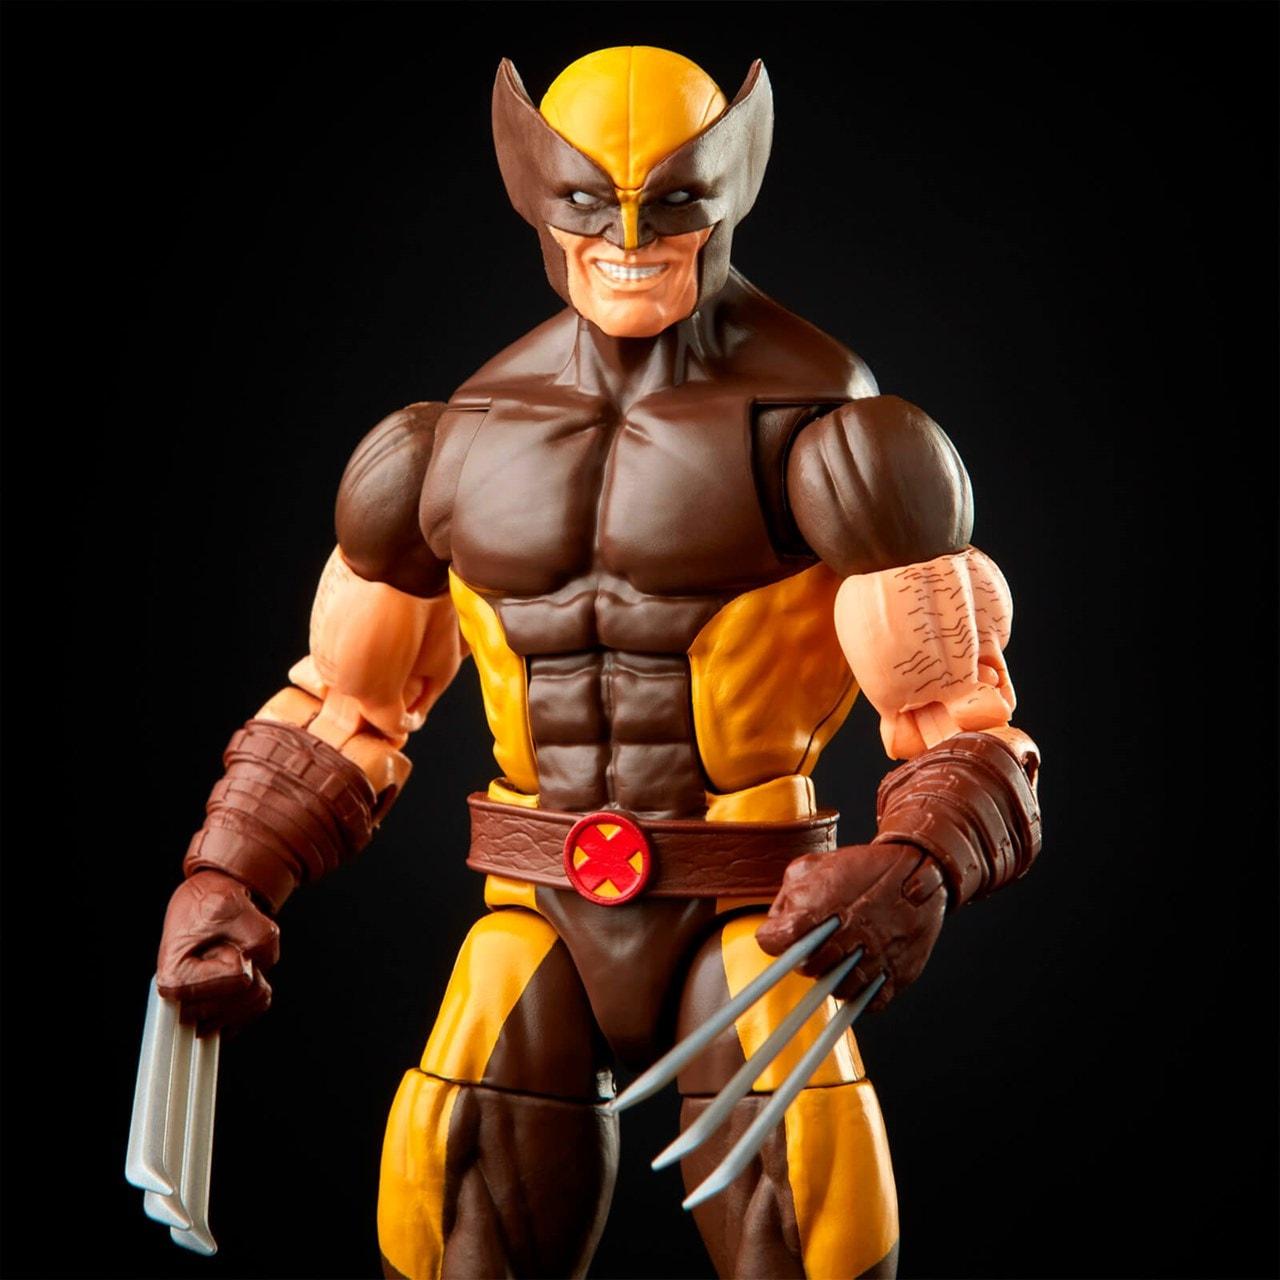 Marvel Legends Series X-Men Wolverine Action Figure - 5